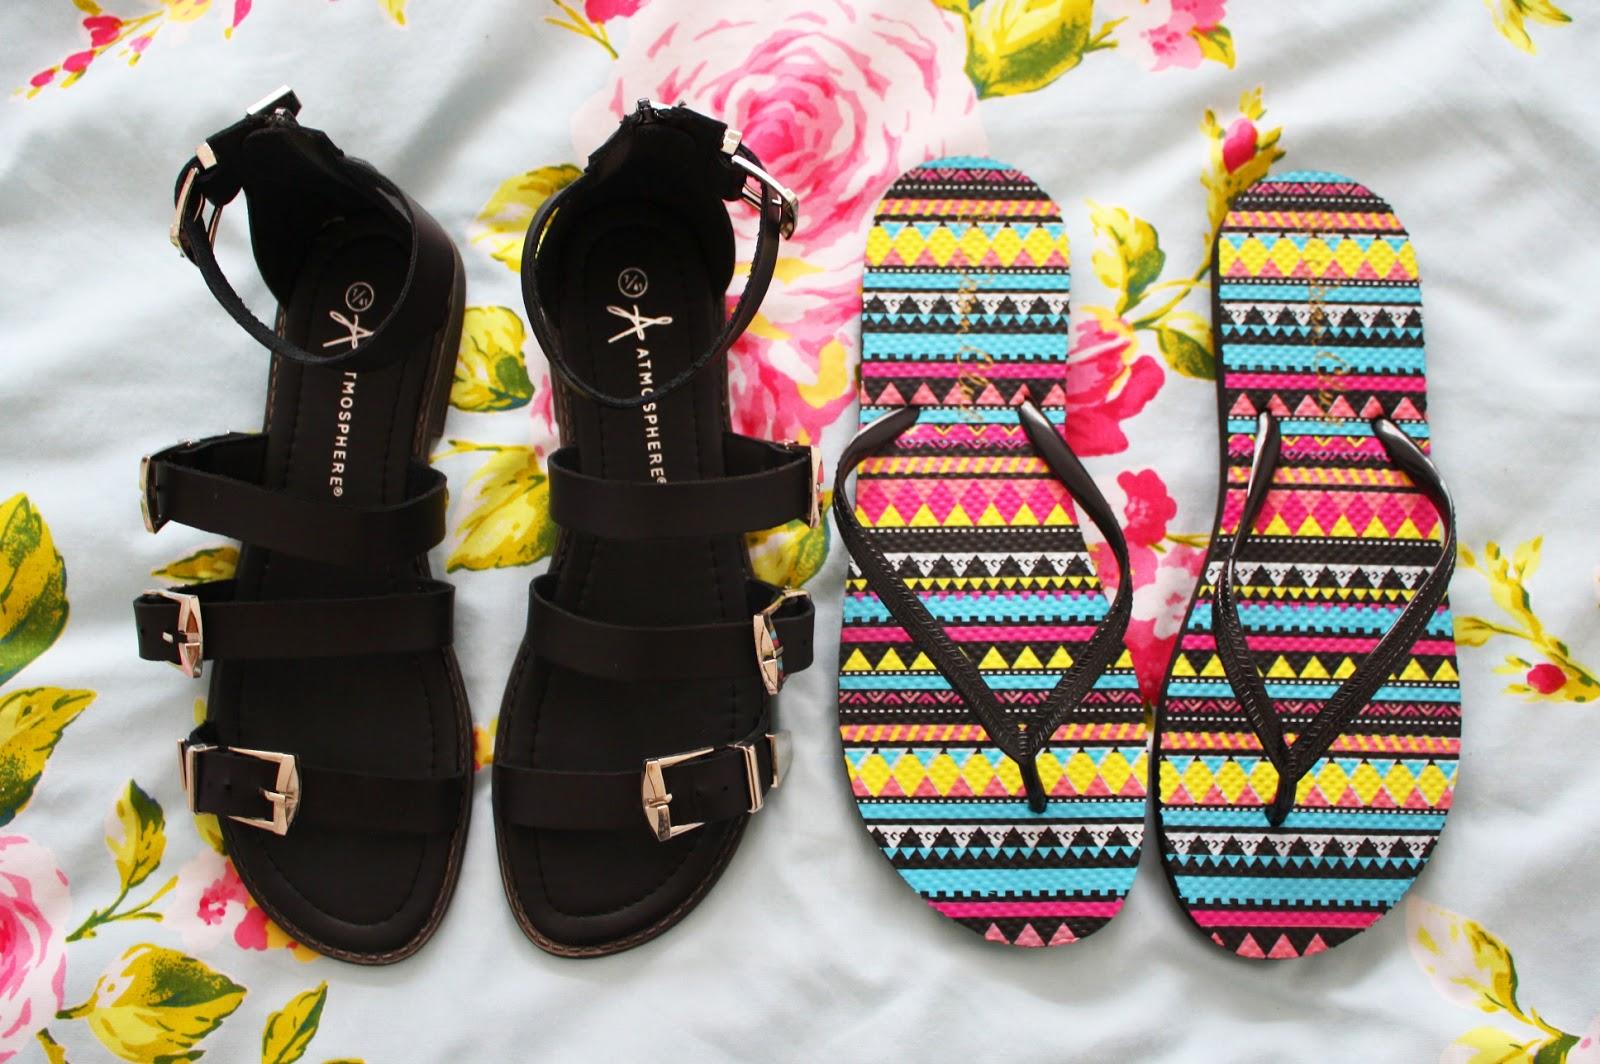 Gladiator sandals and aztec flip flops